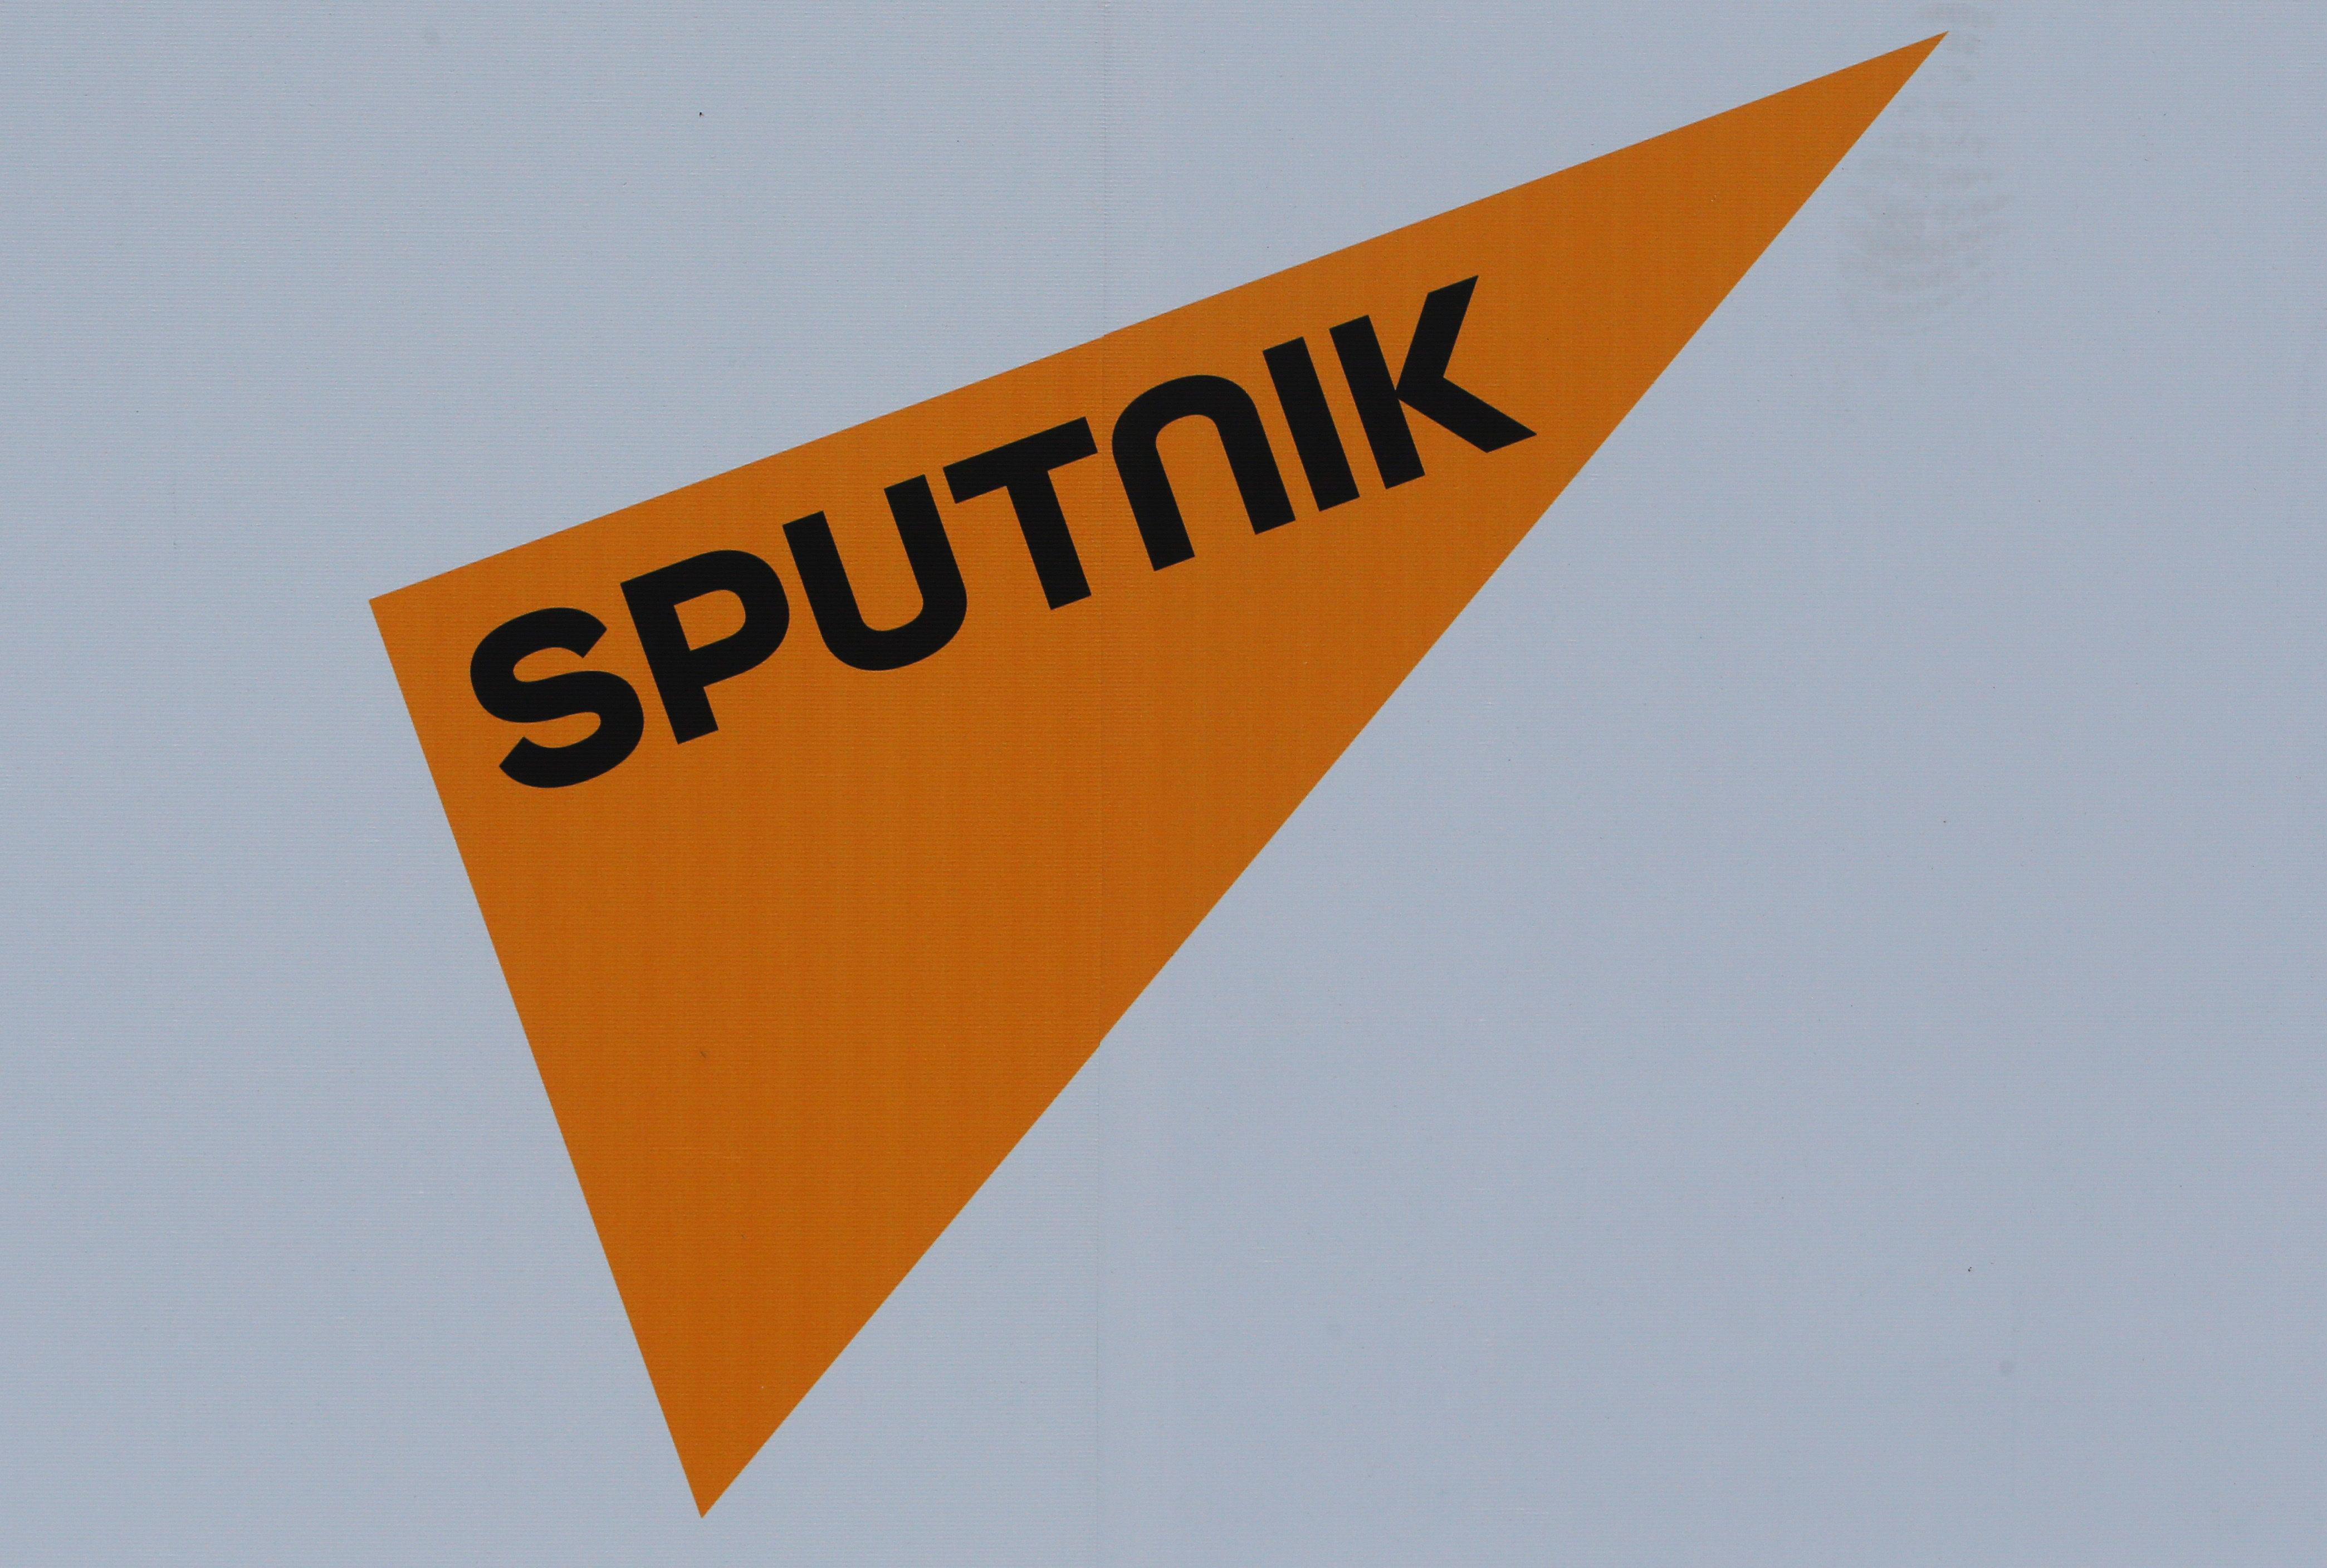 The logo of Russian state news agency Sputnik is seen on a board at the St. Petersburg International Economic Forum 2017 (SPIEF 2017) in St. Petersburg, Russia, June 1, 2017. Picture taken June 1, 2017. REUTERS/Sergei Karpukhin